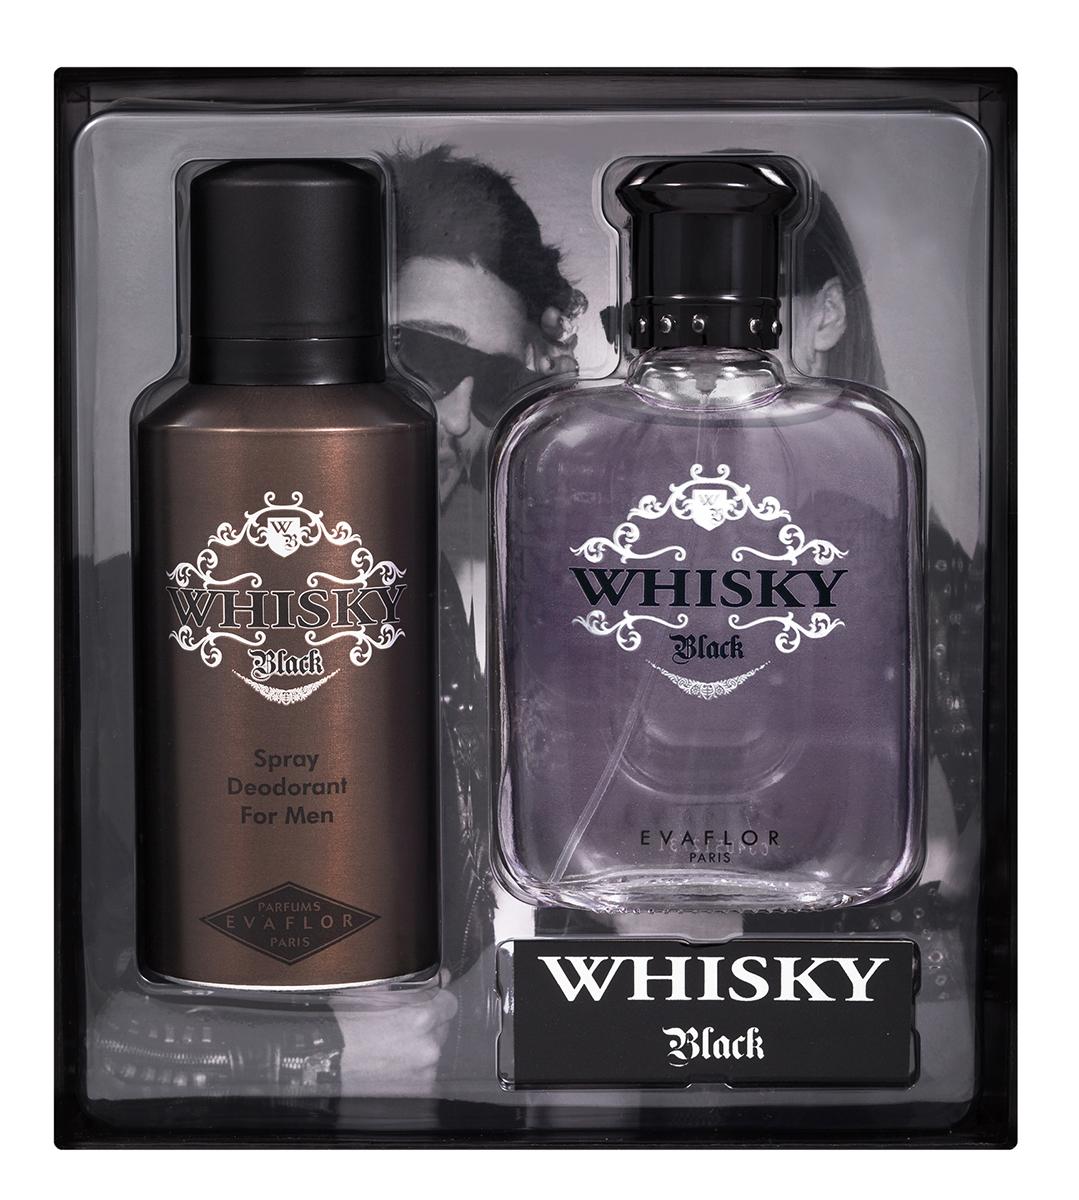 Evaflor Подарочный набор Whisky Black мужской: Туалетная вода, 100 мл , дезодорант, 150 мл1301210Подарочный набор для мужчин : туалетная вода 100мл, парфюмированный дезодорант 150 мл.